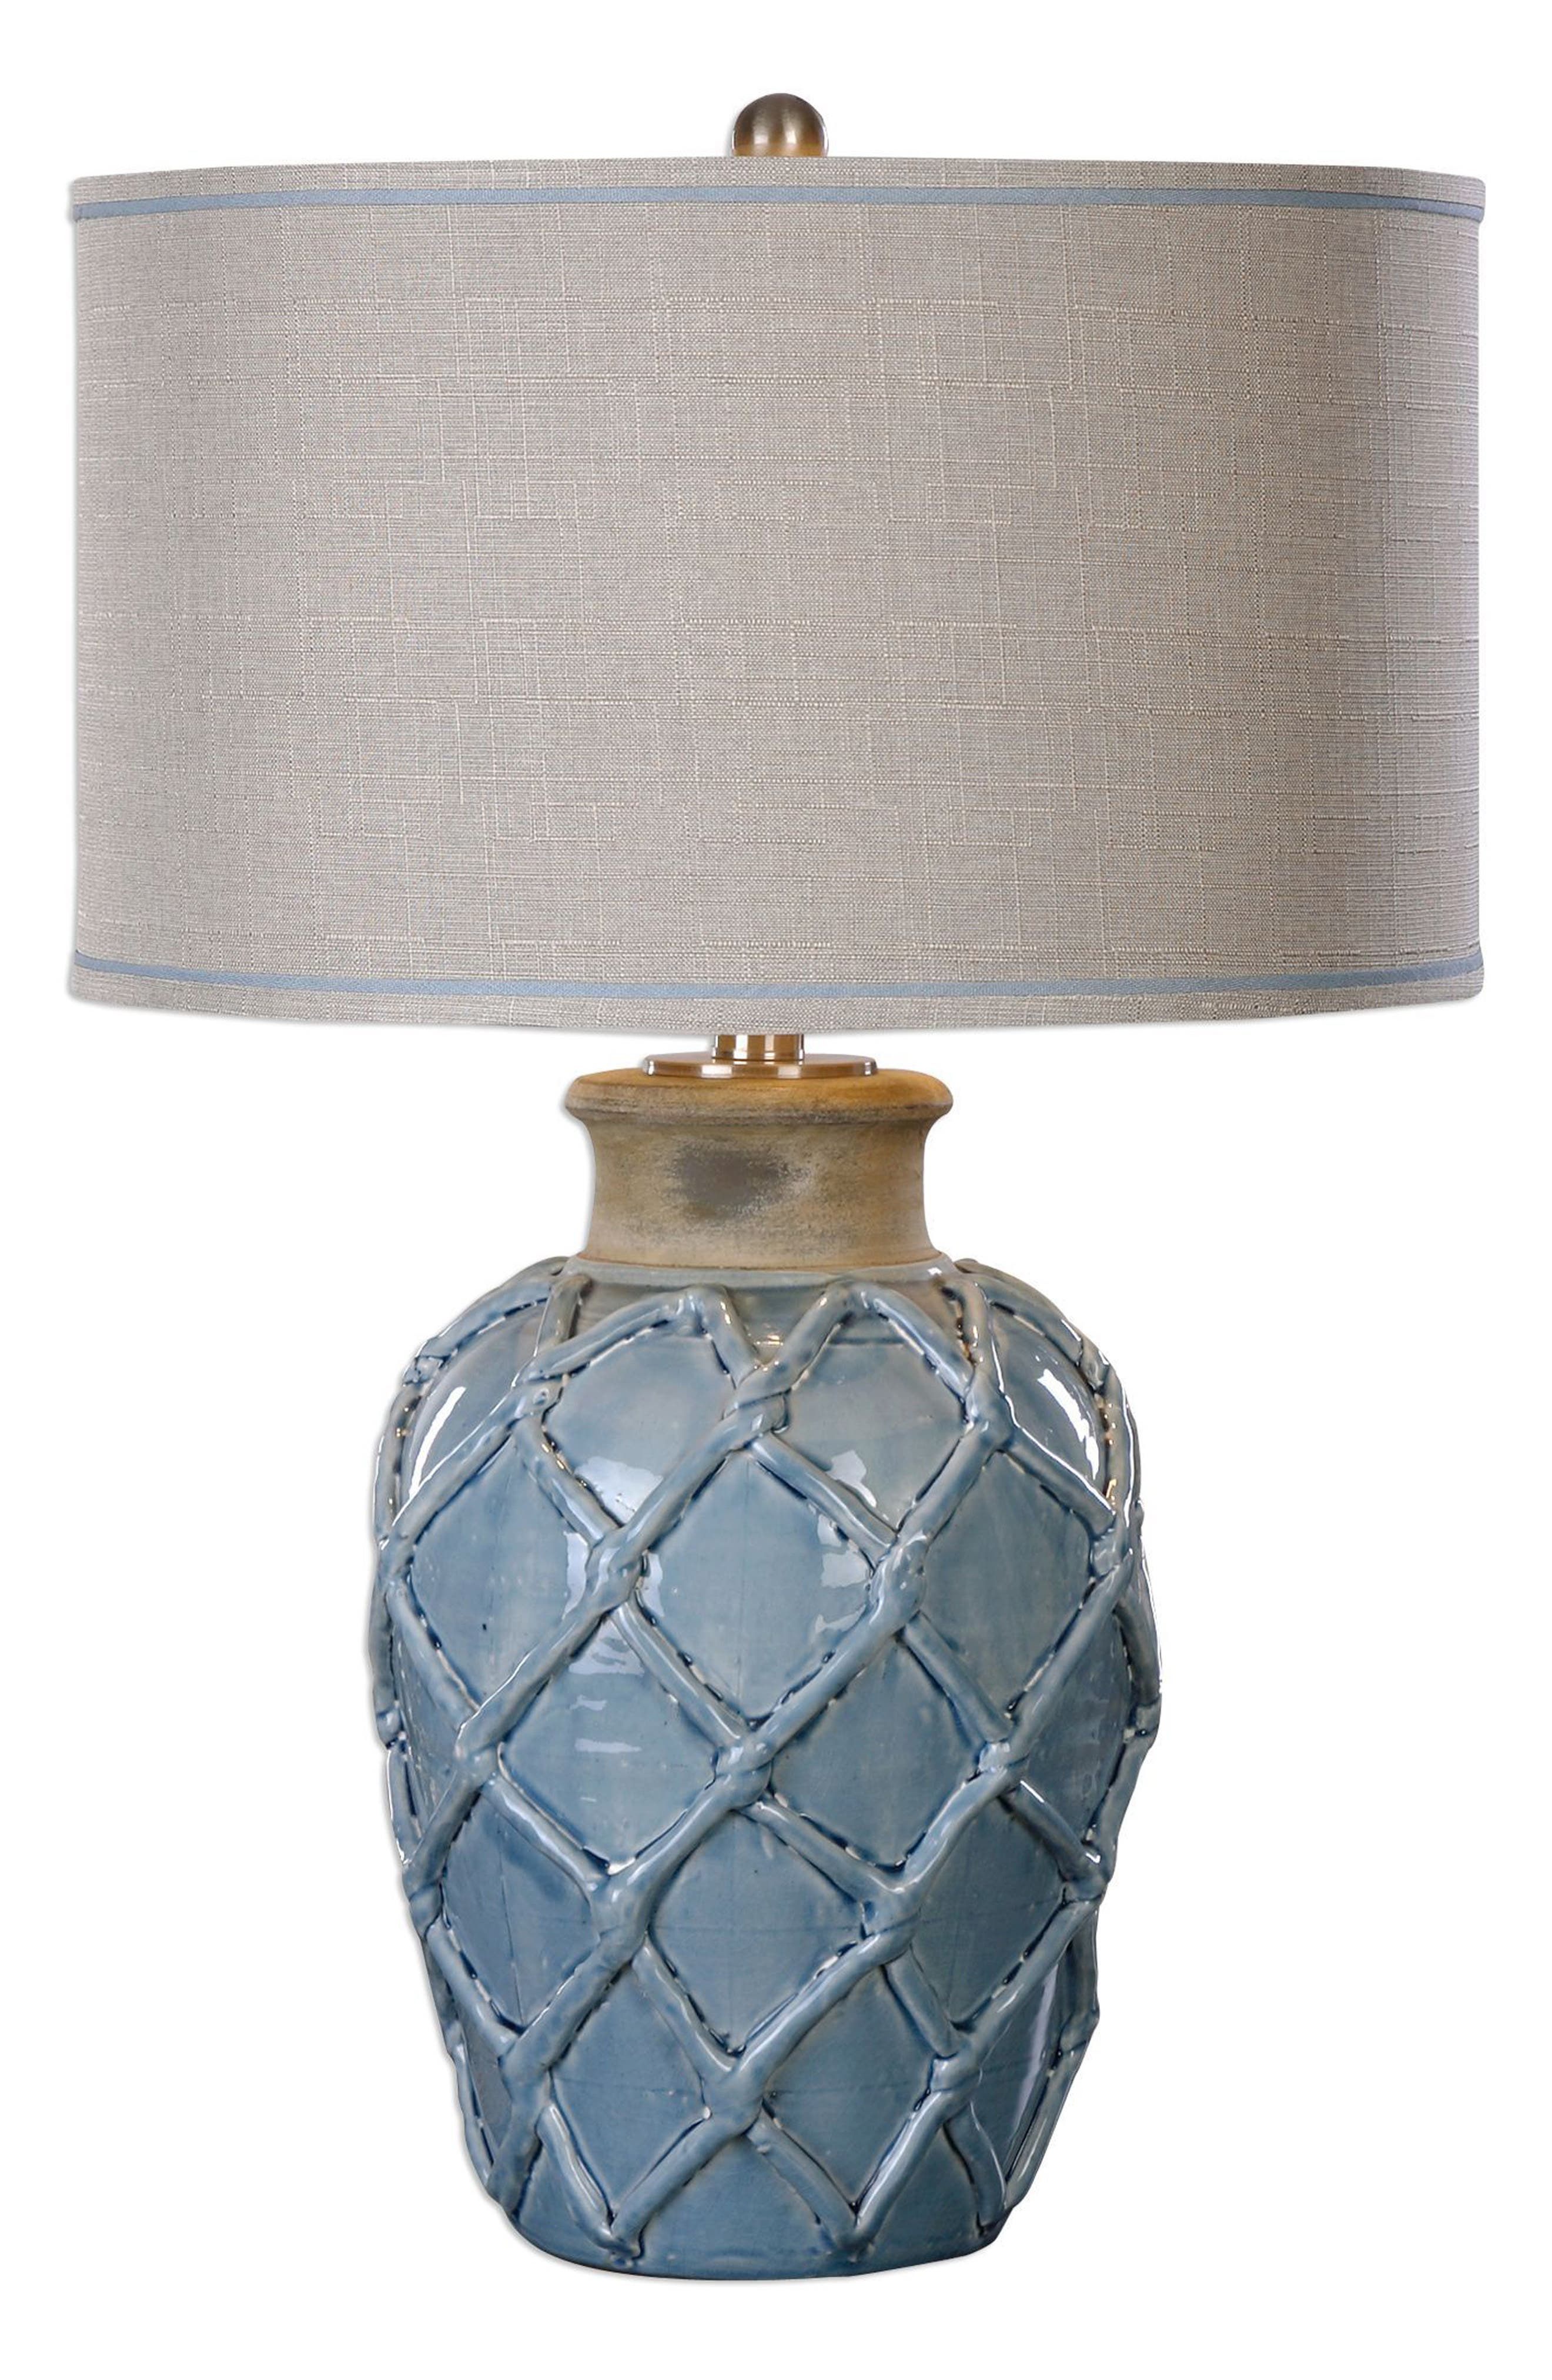 Parterre Table Lamp,                             Main thumbnail 1, color,                             400